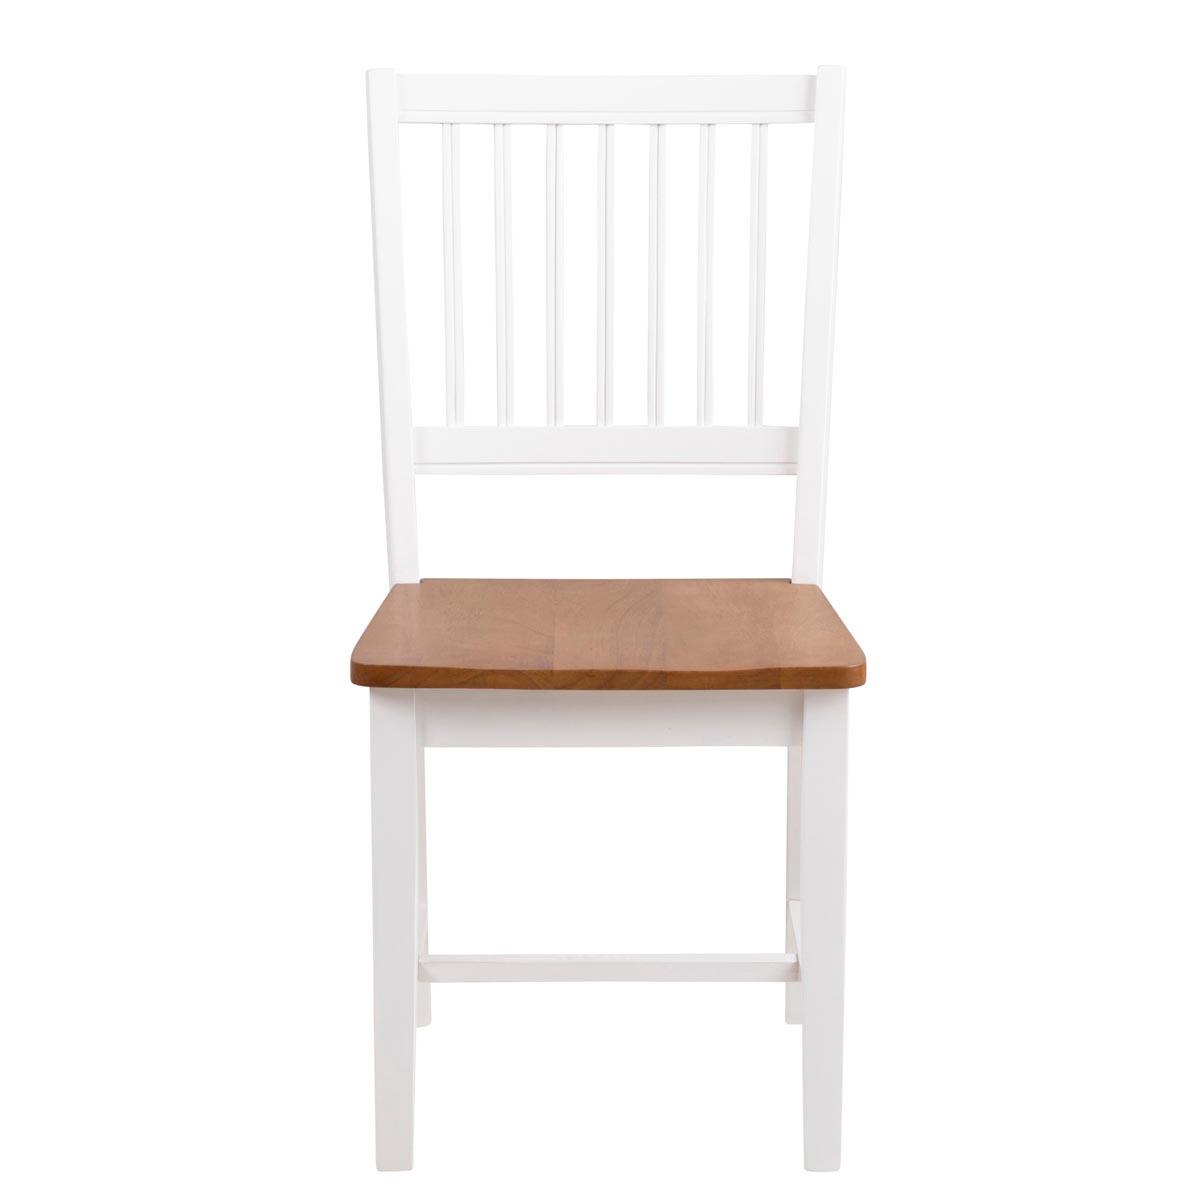 BRISBANE-stol-rakt